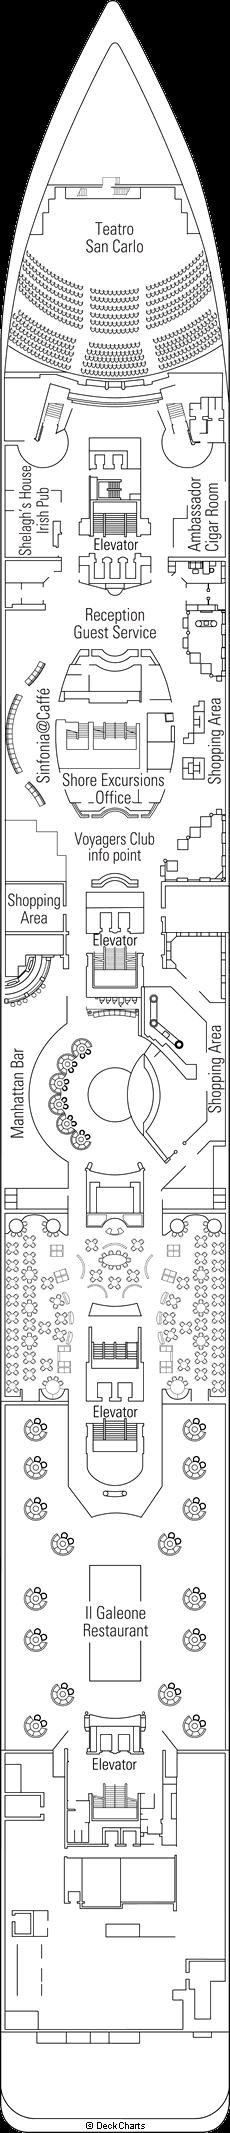 MSC Sinfonia: Beethoven Deck